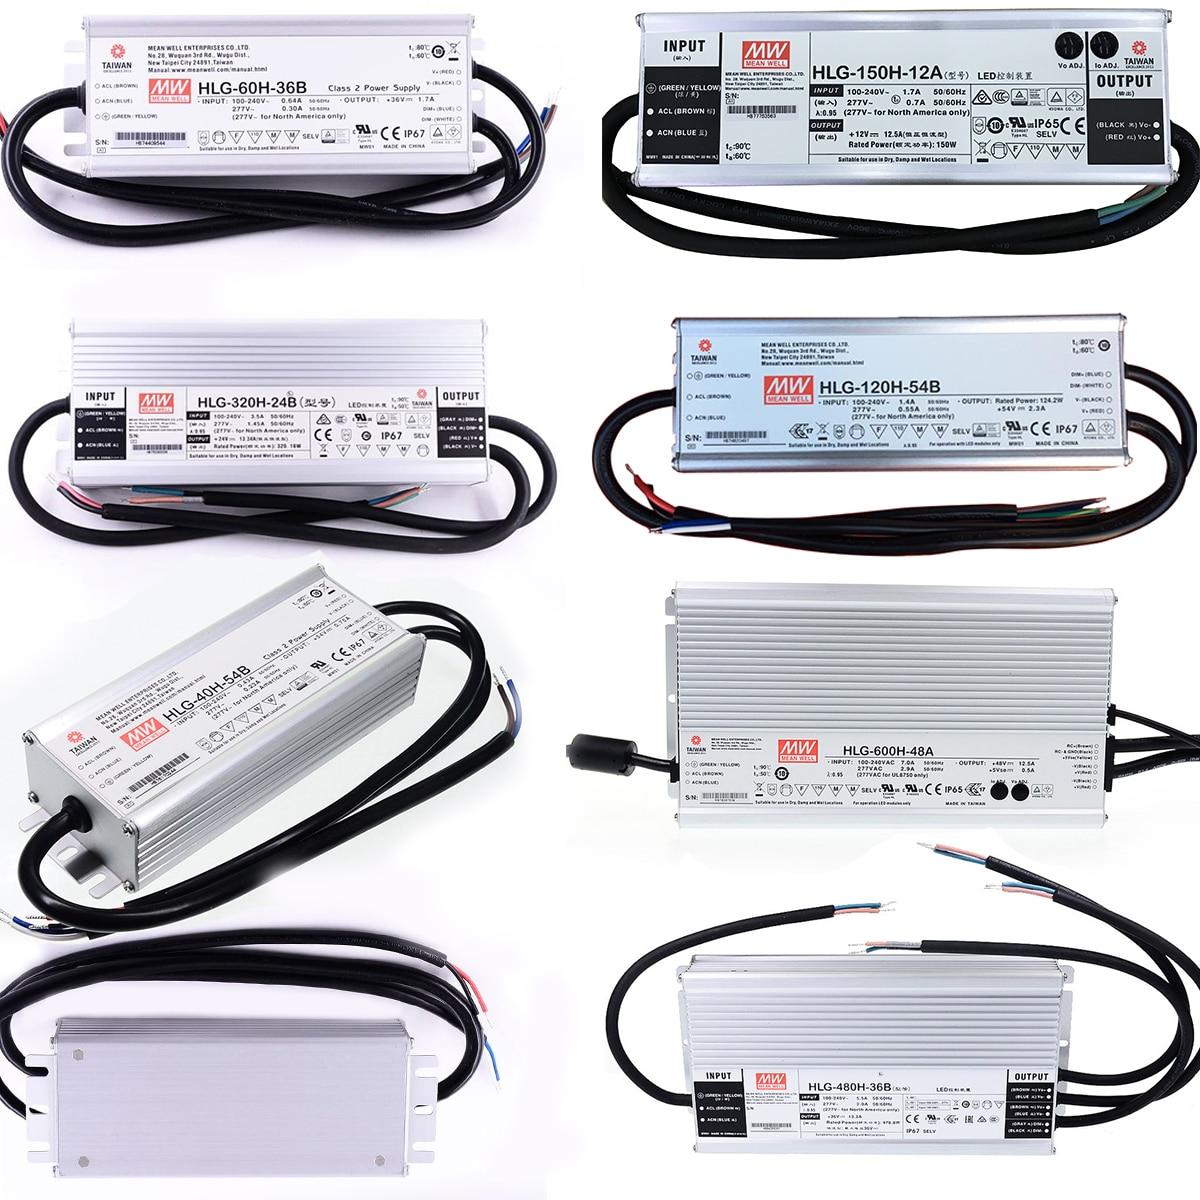 HLG-40H/60H/80H/100H/120H acdc 12/15/20/24/30/36/42/48/54V Meanwell Controlador led cuadrado/LED/crece la iluminación